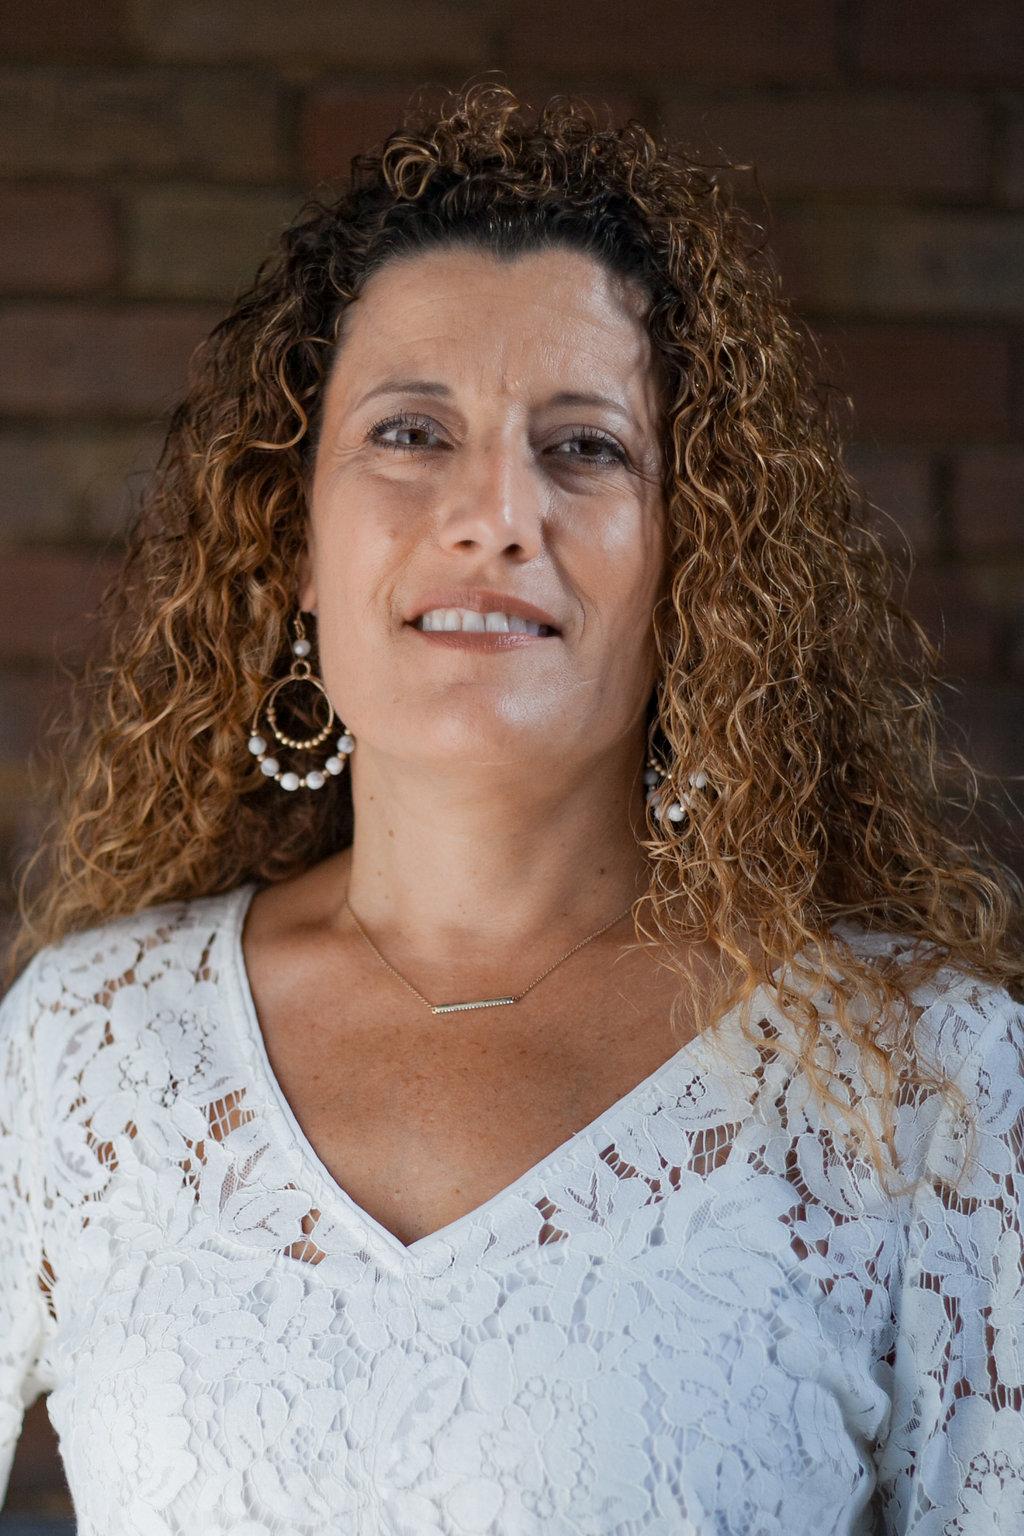 Angie Gabehart